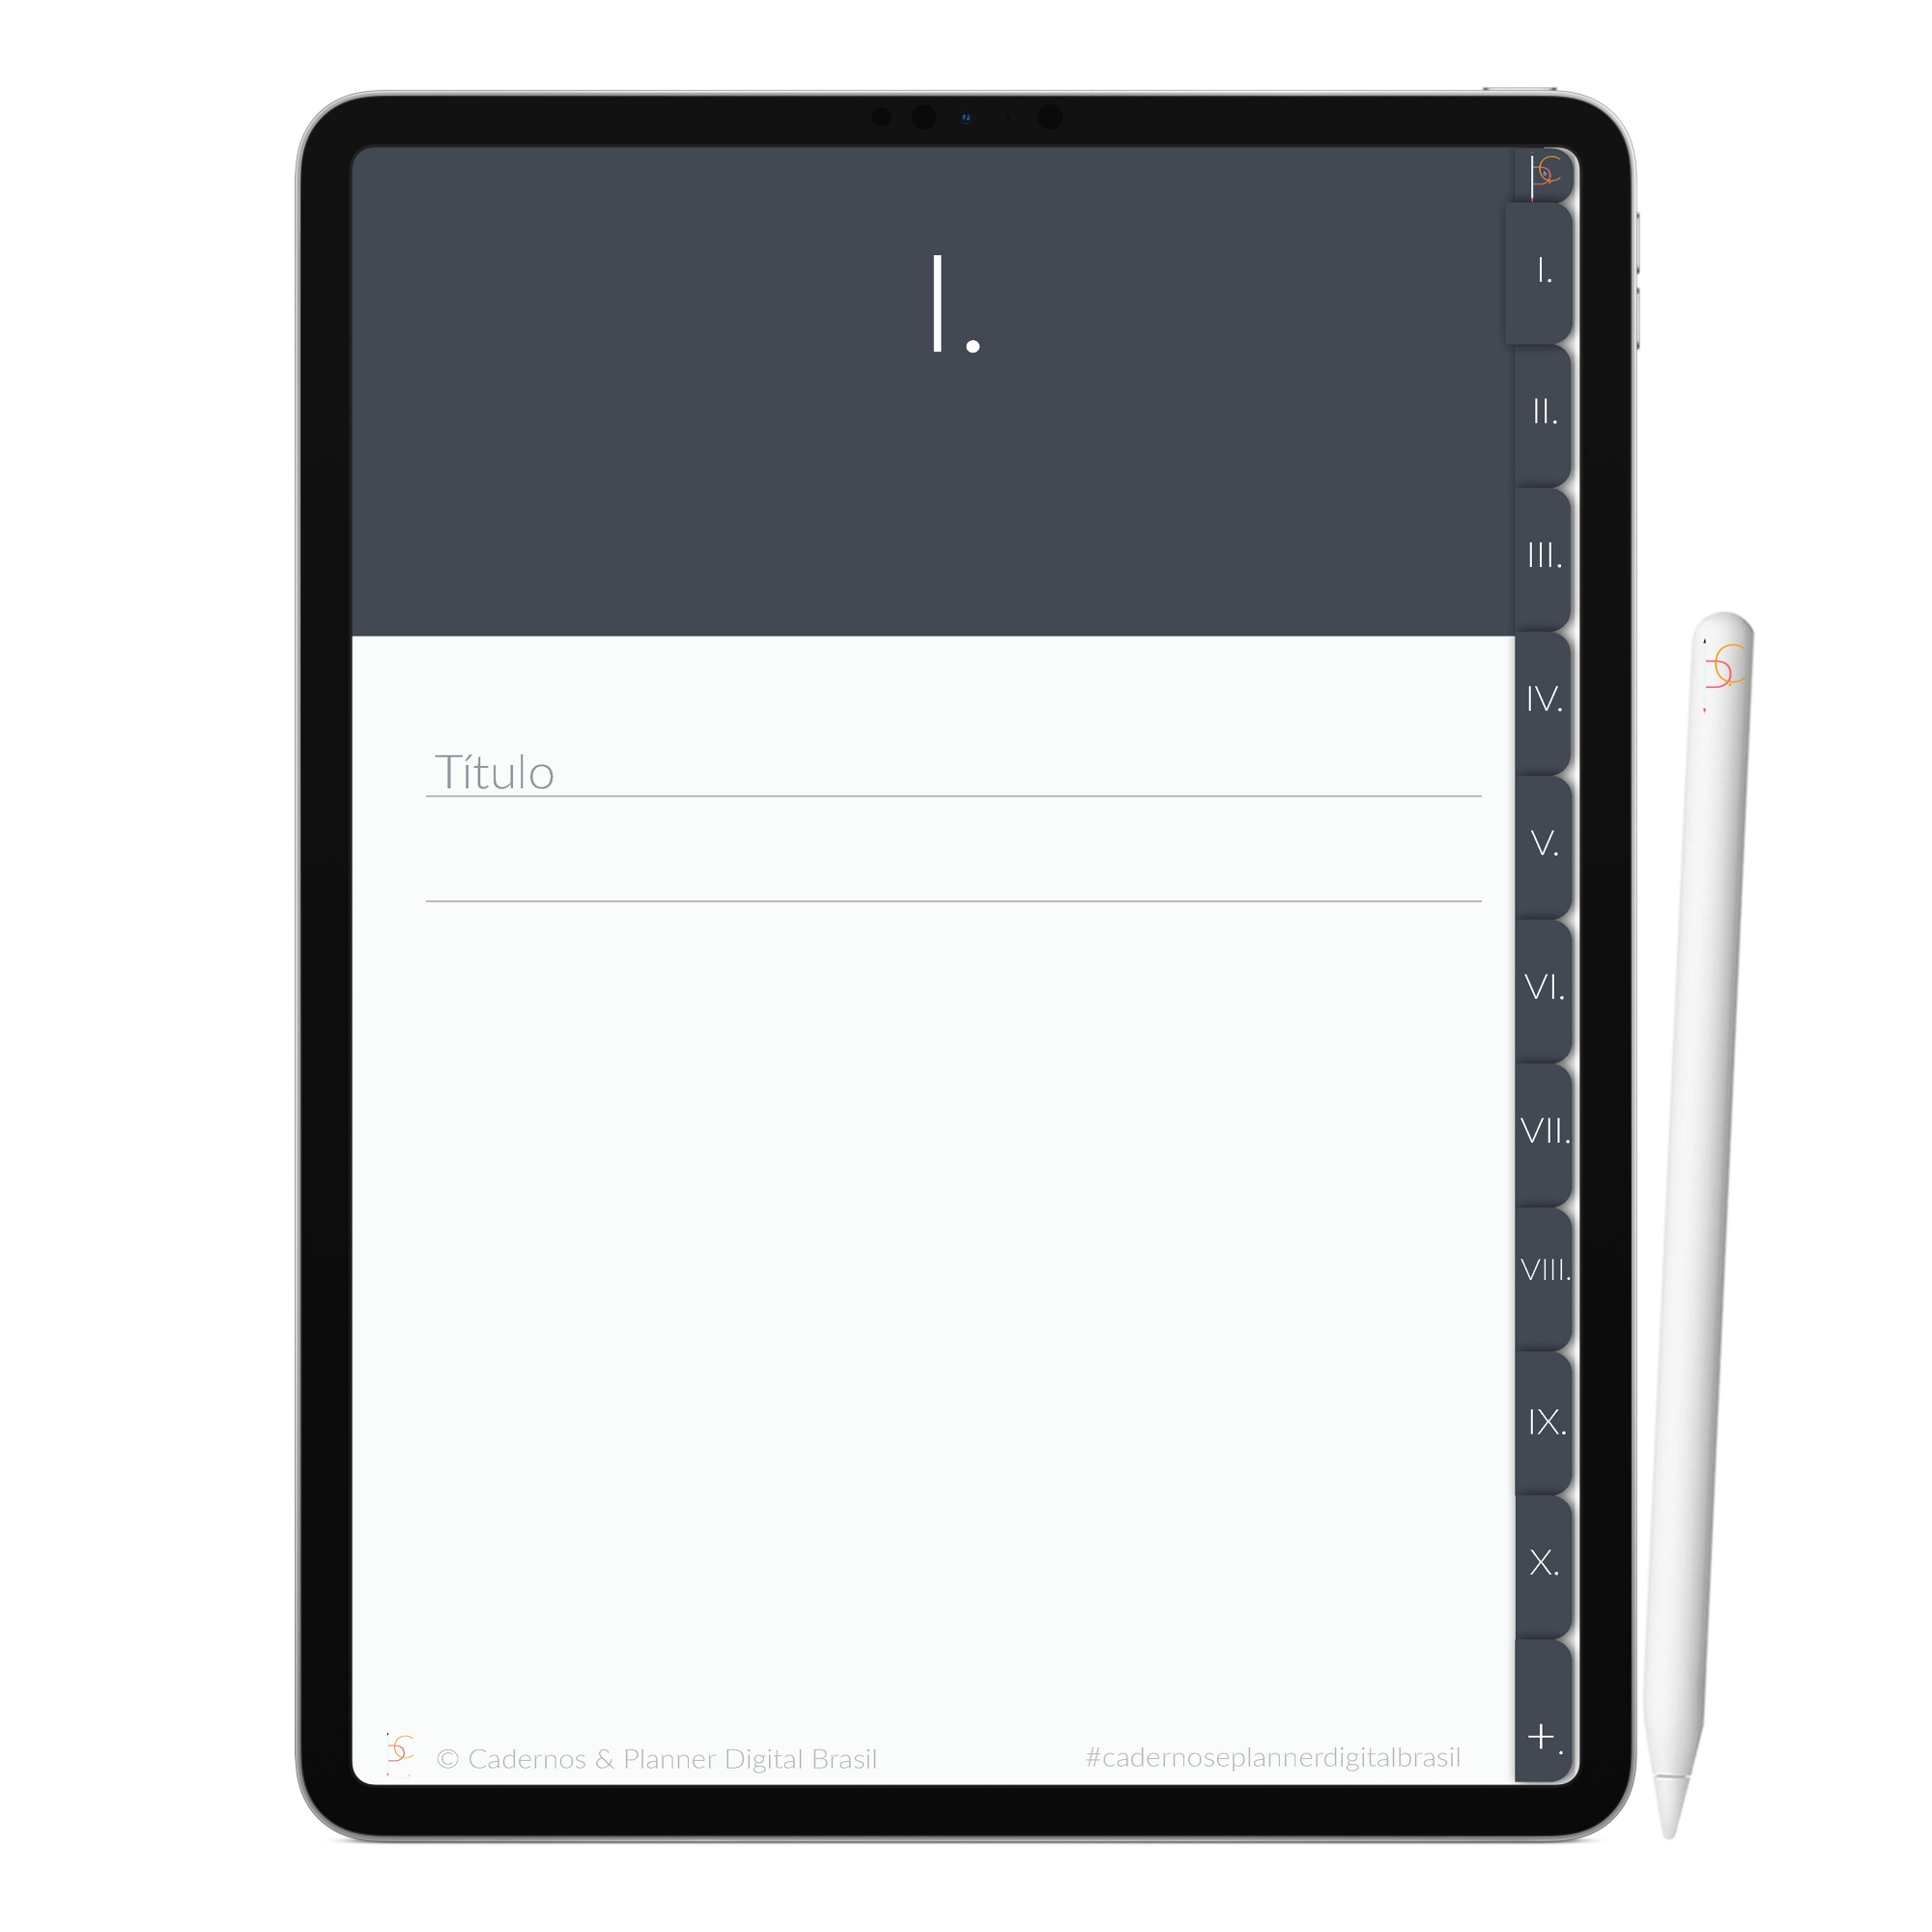 Caderno Digital Minimalista Oceanos Imensidão | Dez Divisórias Interativo| iPad Tablet | Download Instantâneo